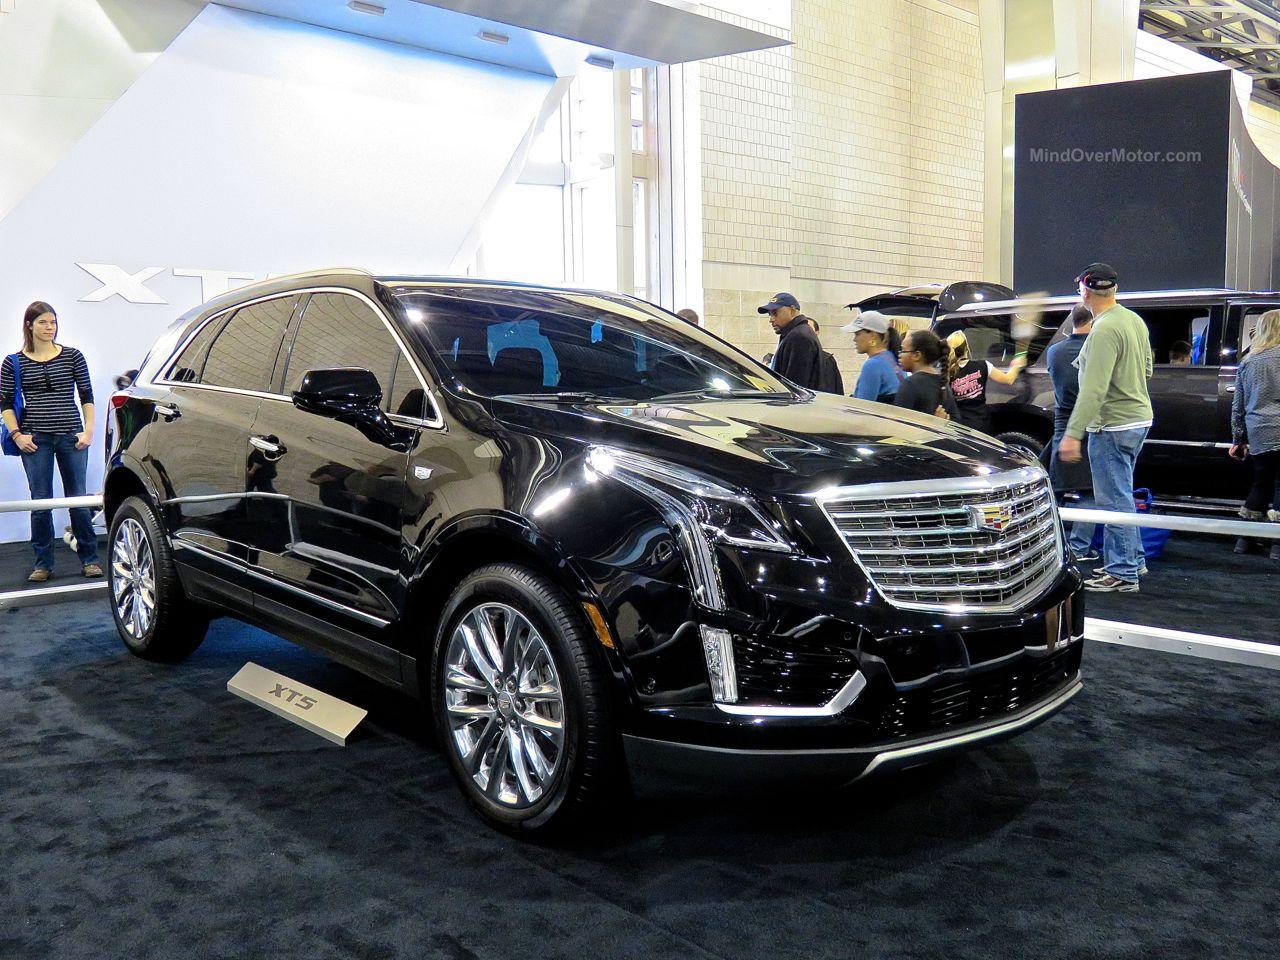 Philly Auto Show 2016 Cadillac XT5